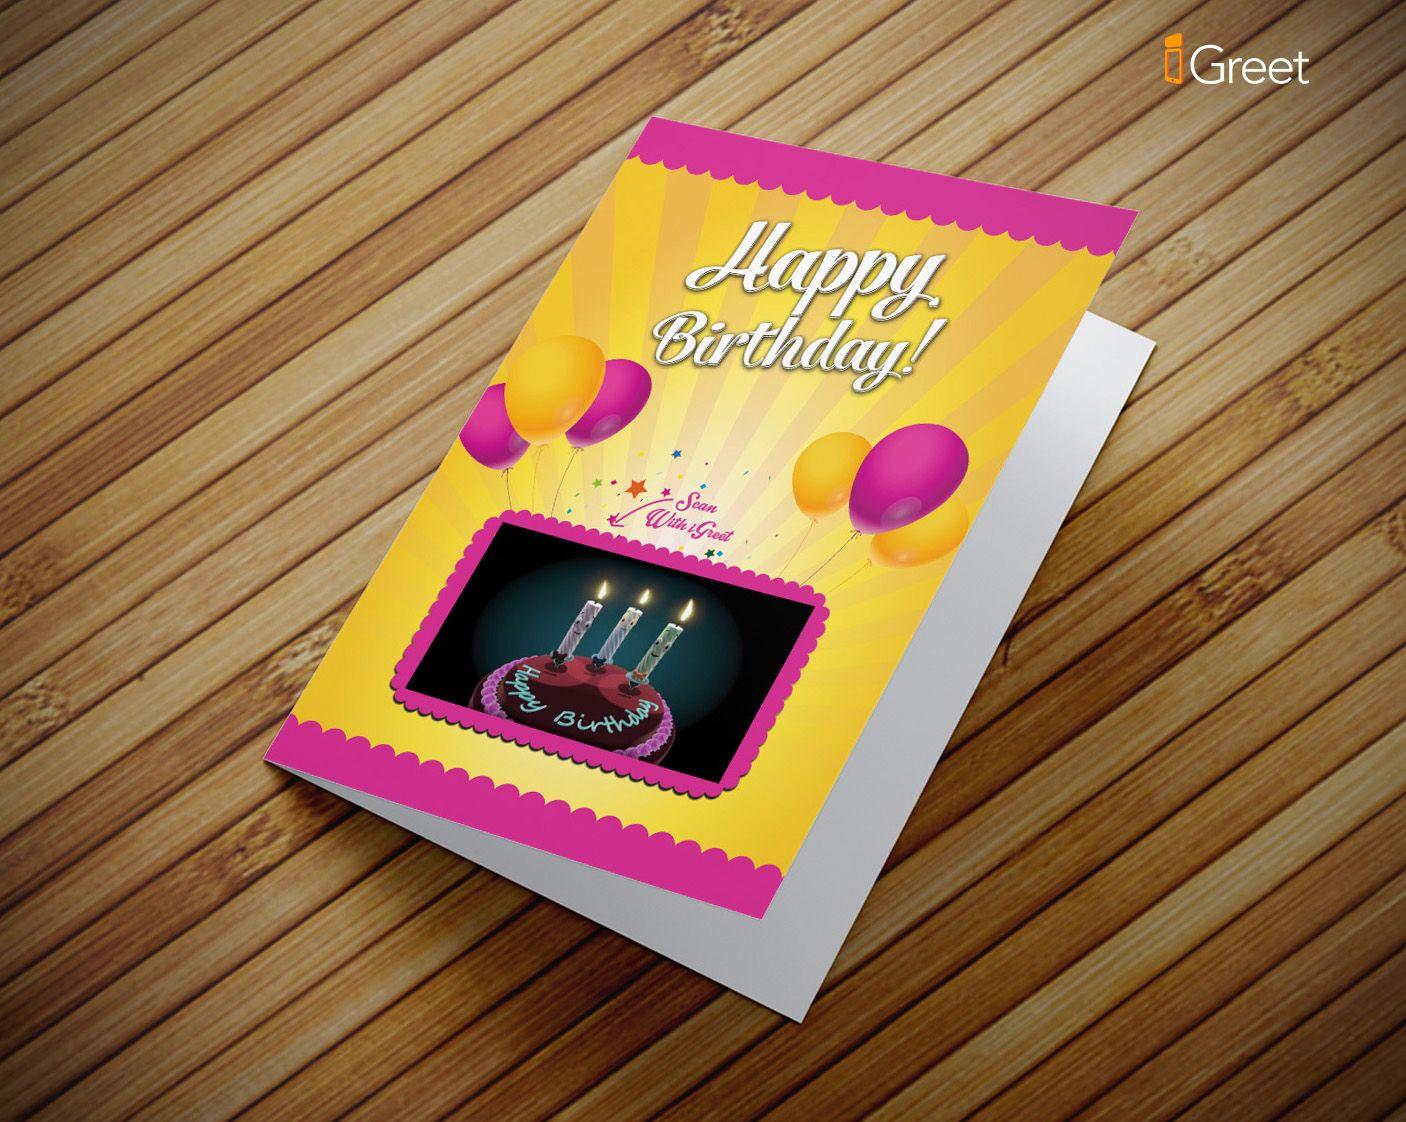 Happy birthday singing candles greeting card augmented reality augmented reality happy birthday singing candles greeting card m4hsunfo